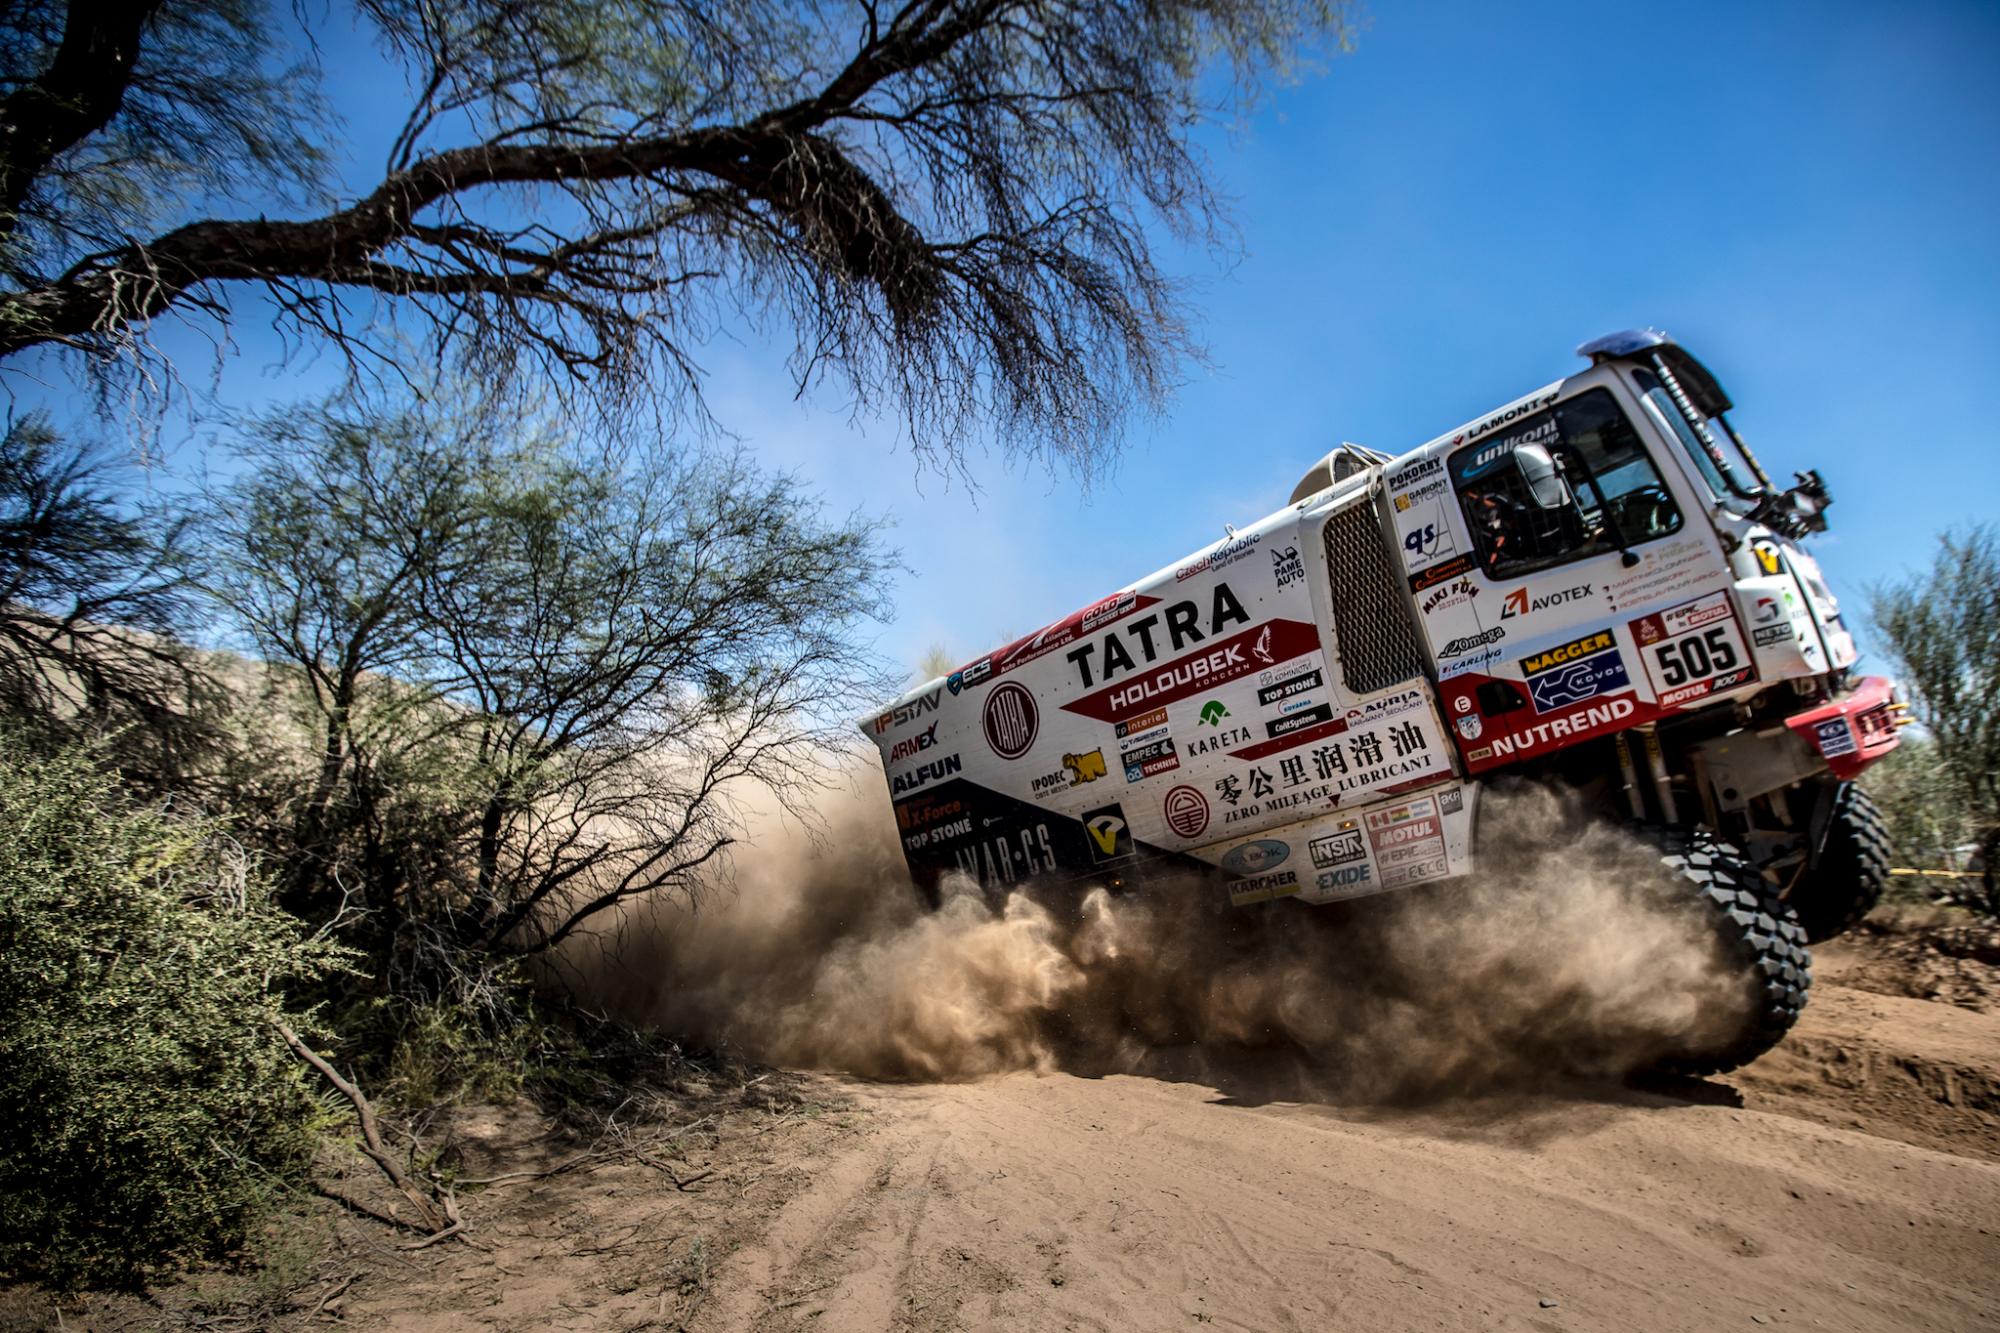 Kolomy, Dakar 2018